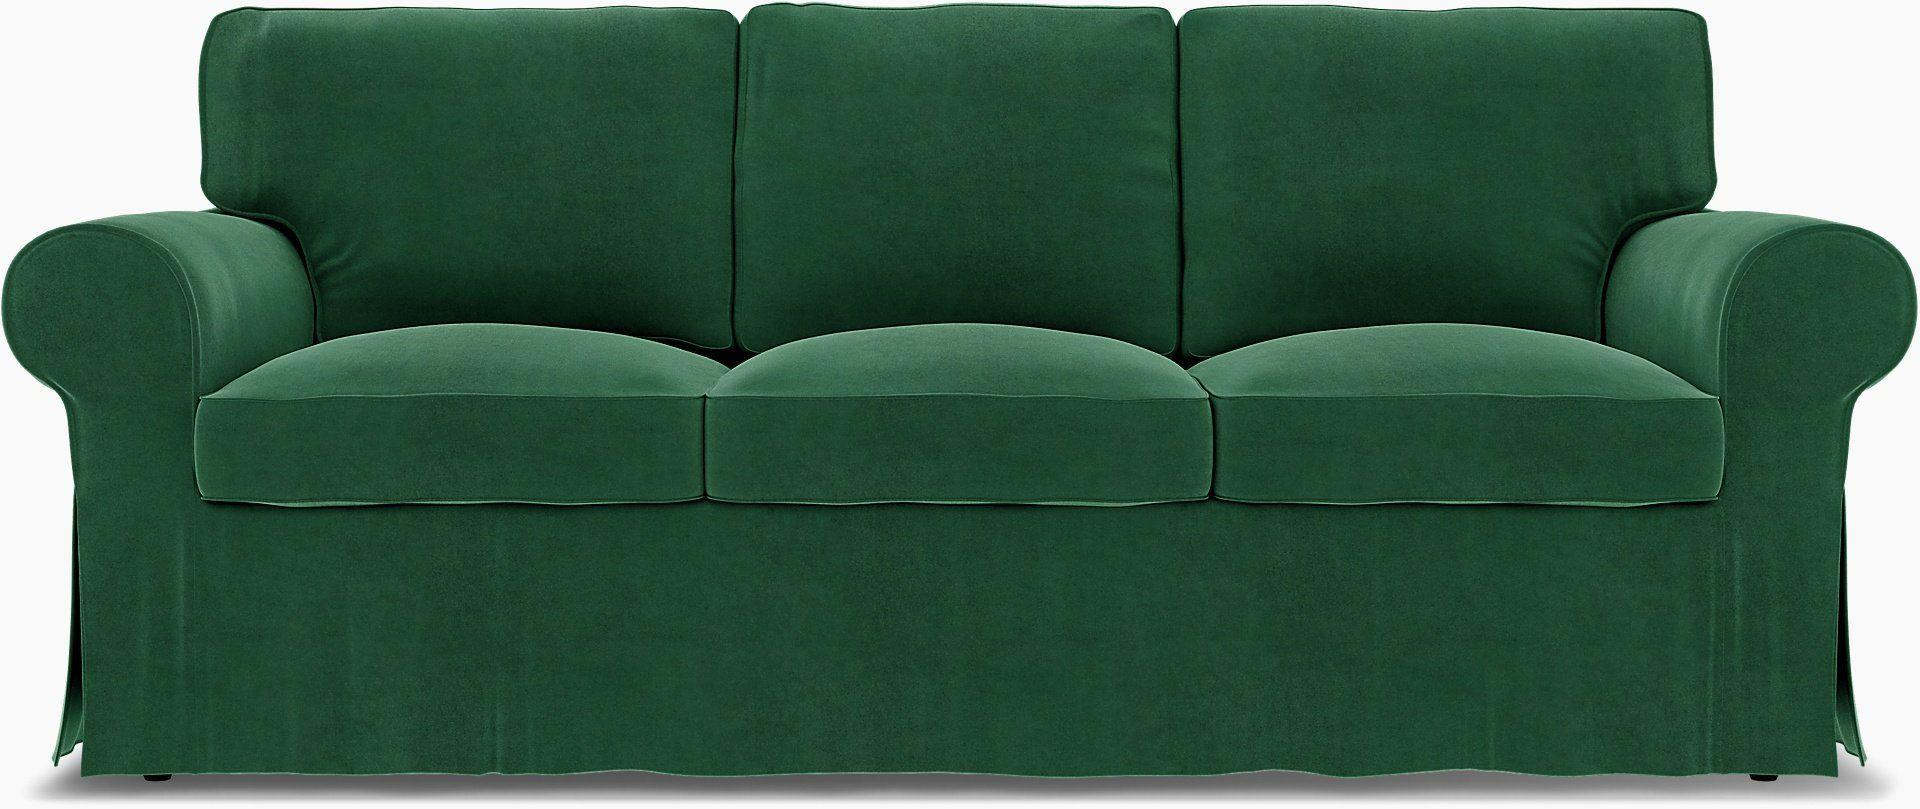 IKEA Ektorp, 3 Seater sofa cover with piping Bemz Bemz